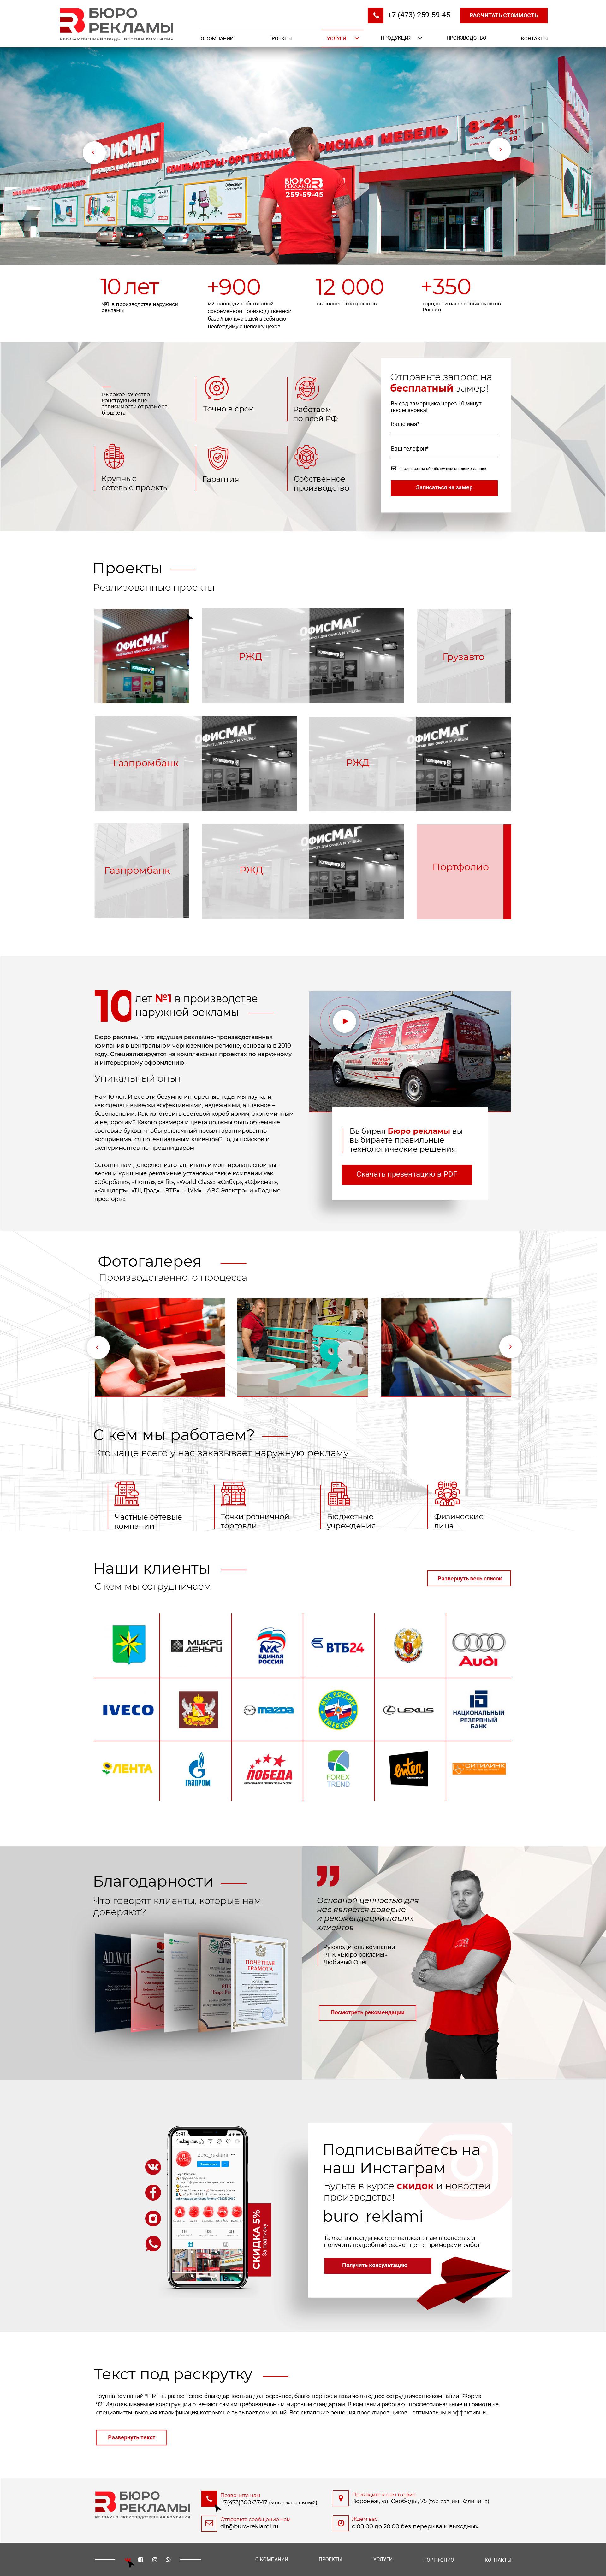 b2b сайты примеры Бюро рекламы 1920 px